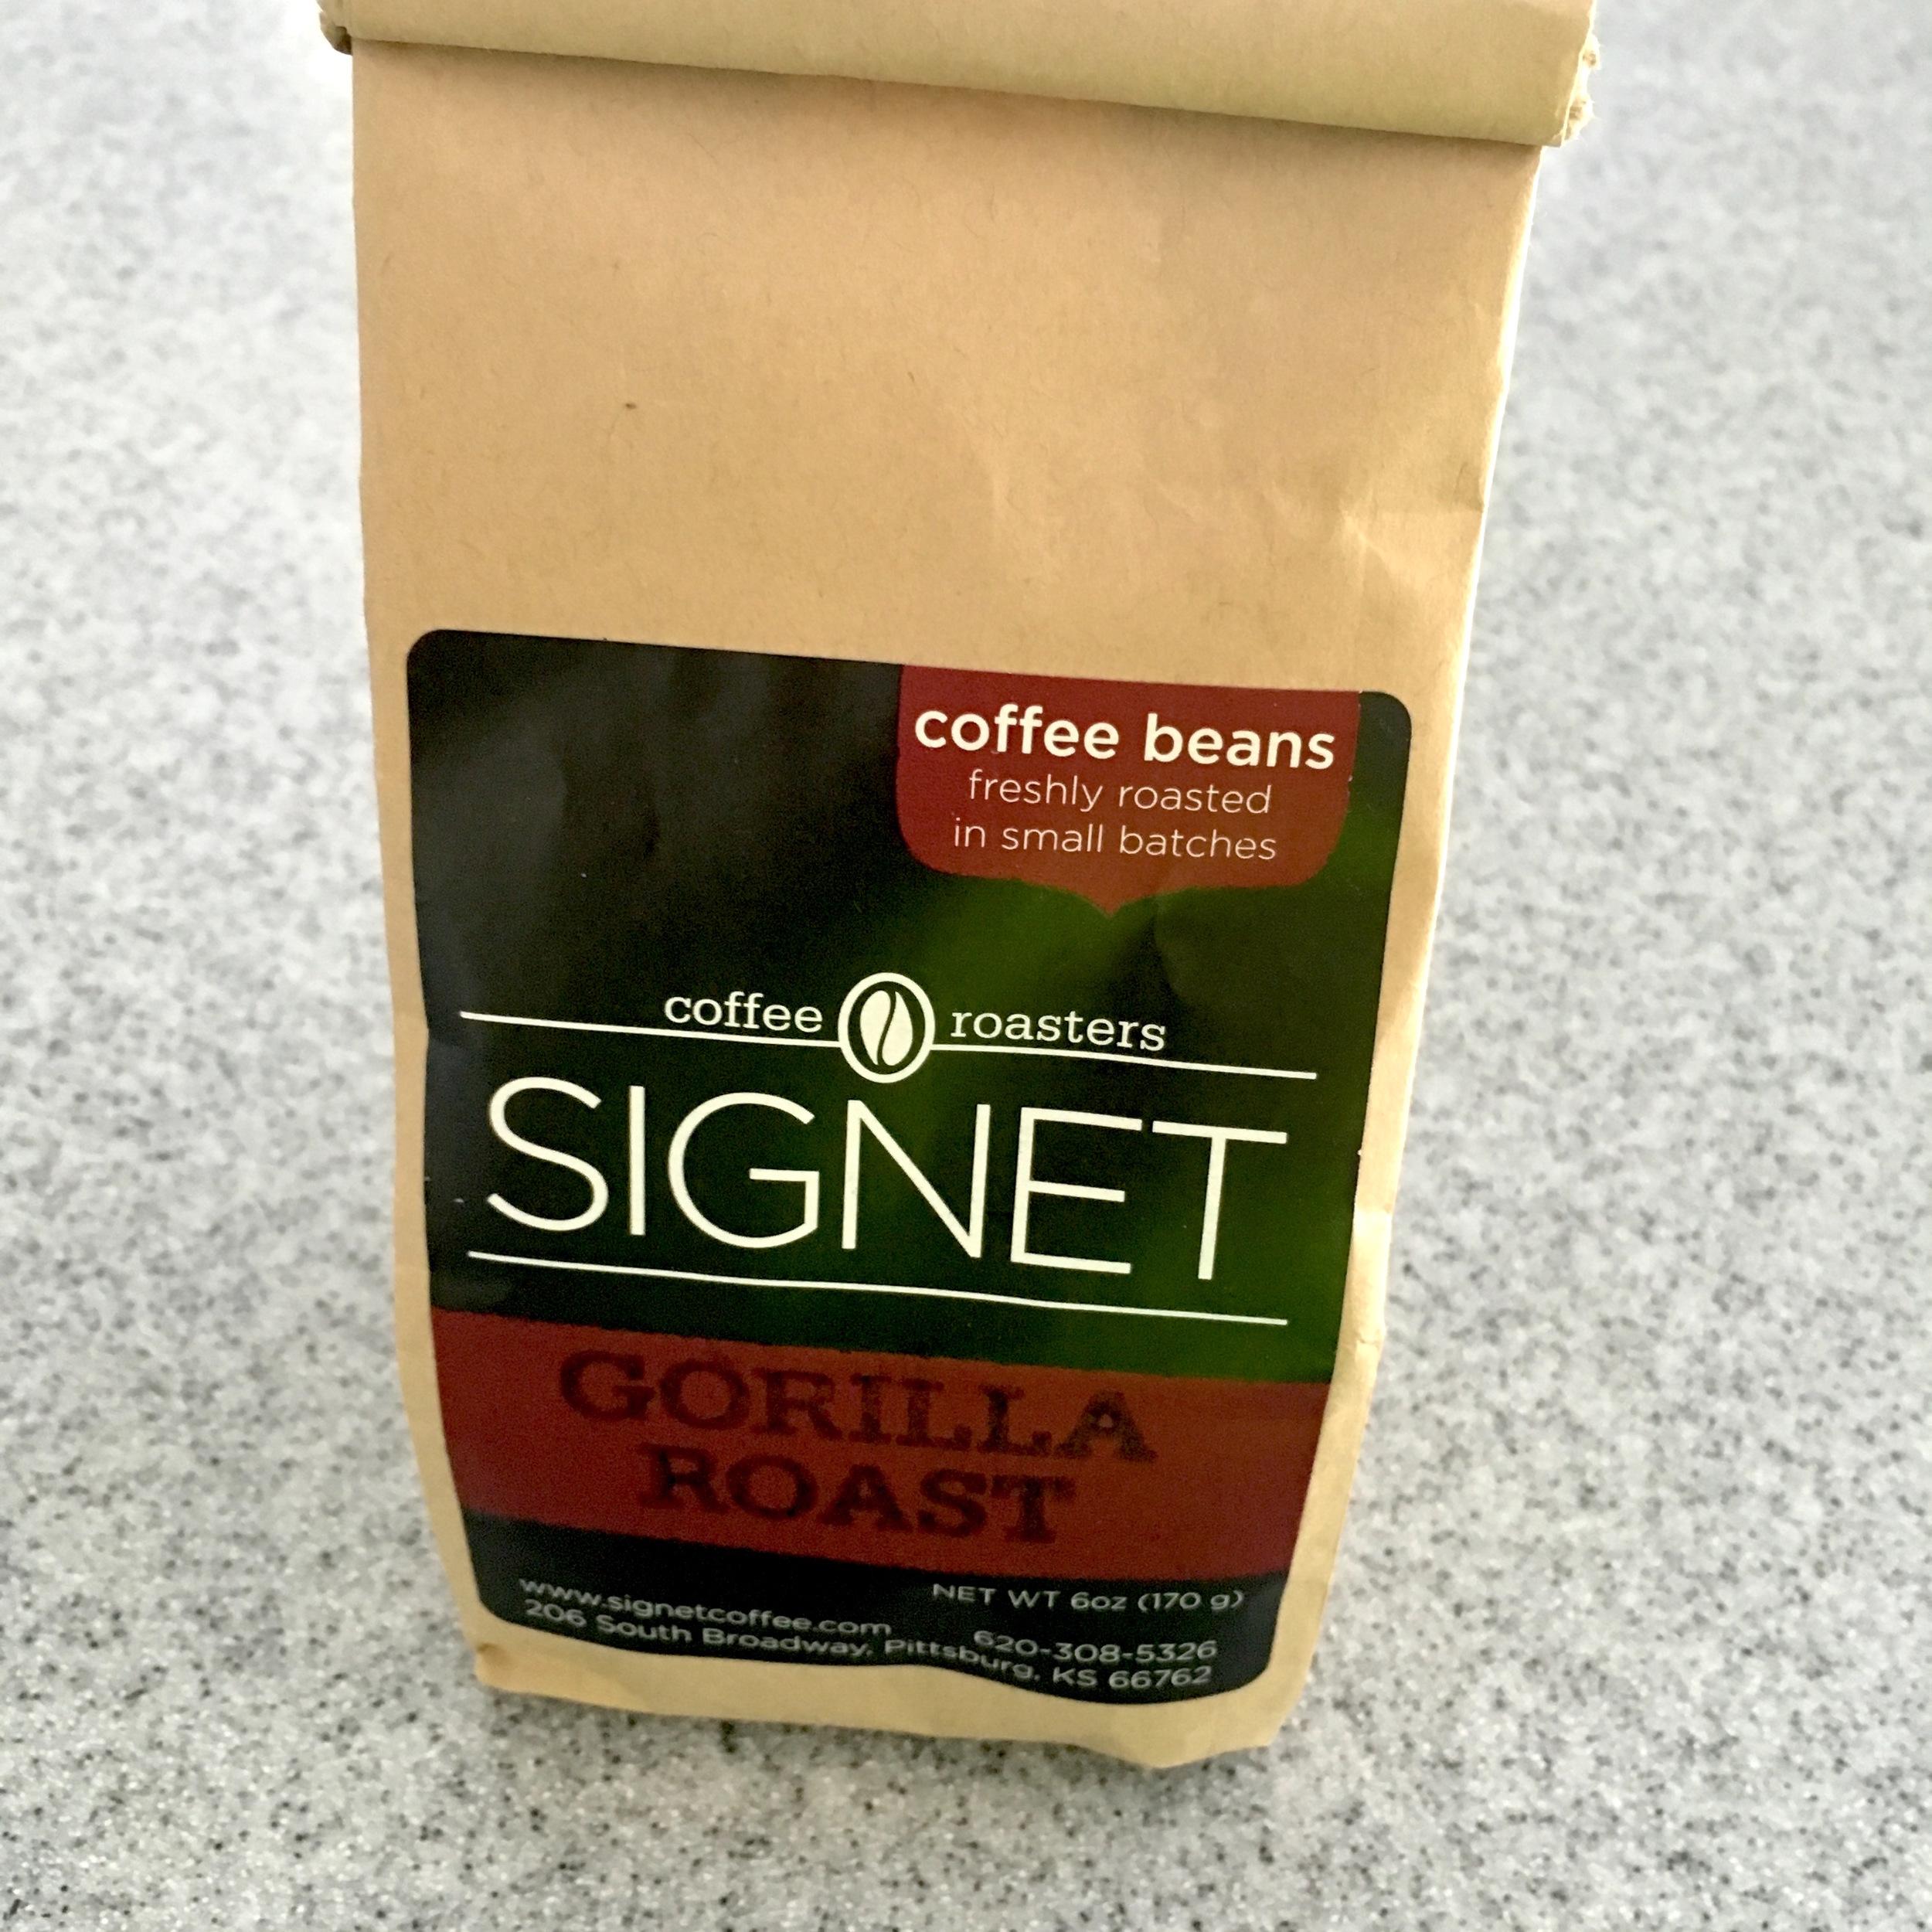 Signet Gorilla Roast Blend